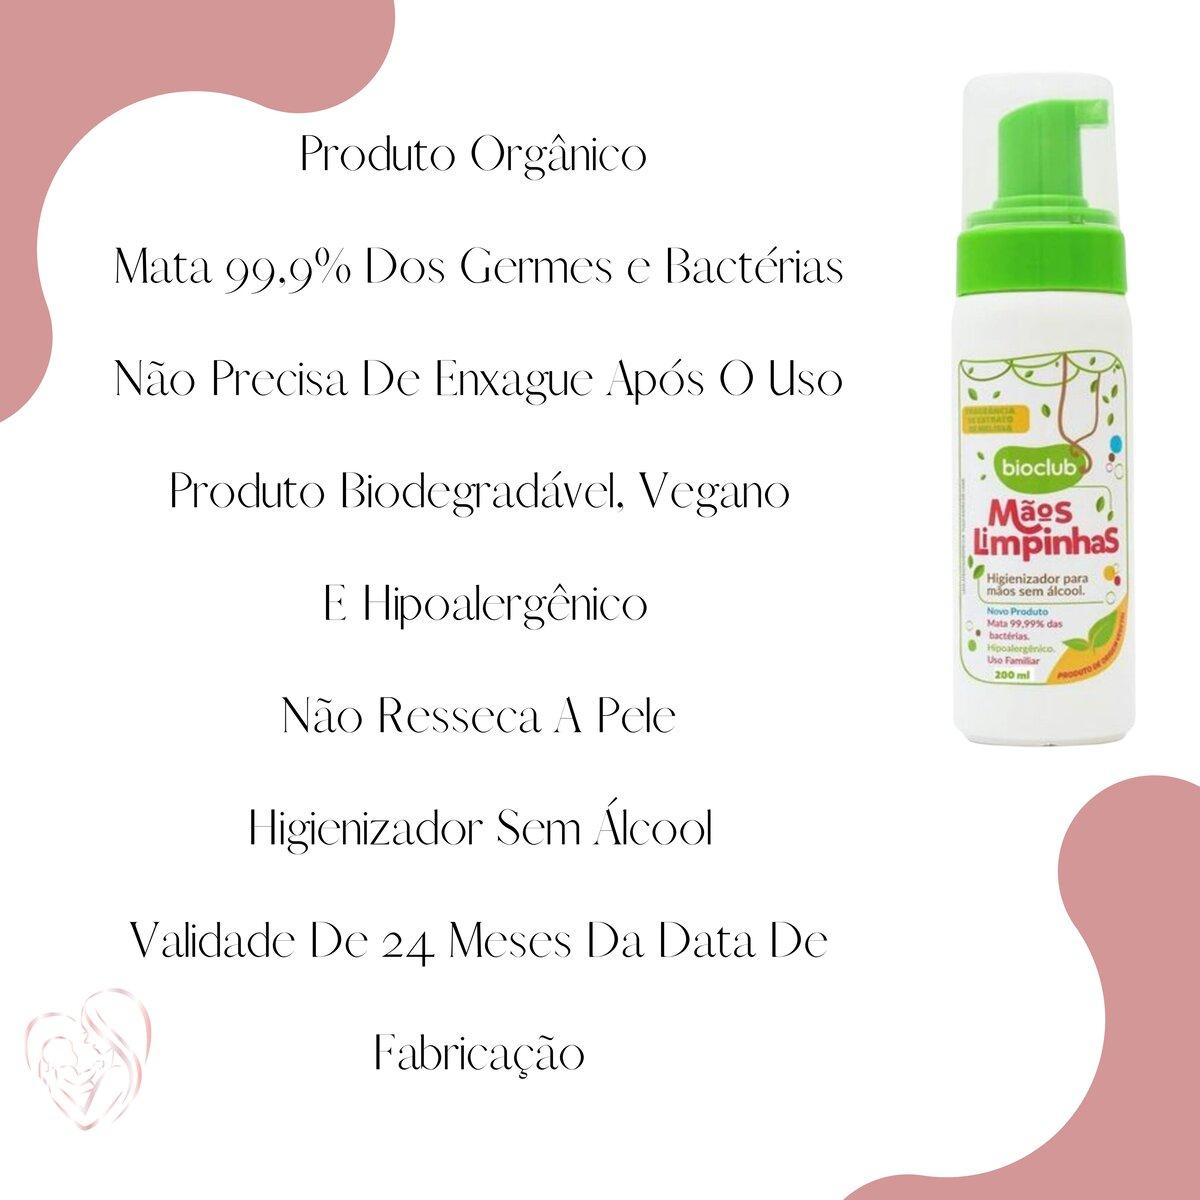 Mãos Limpinhas Bioclub® 150ml